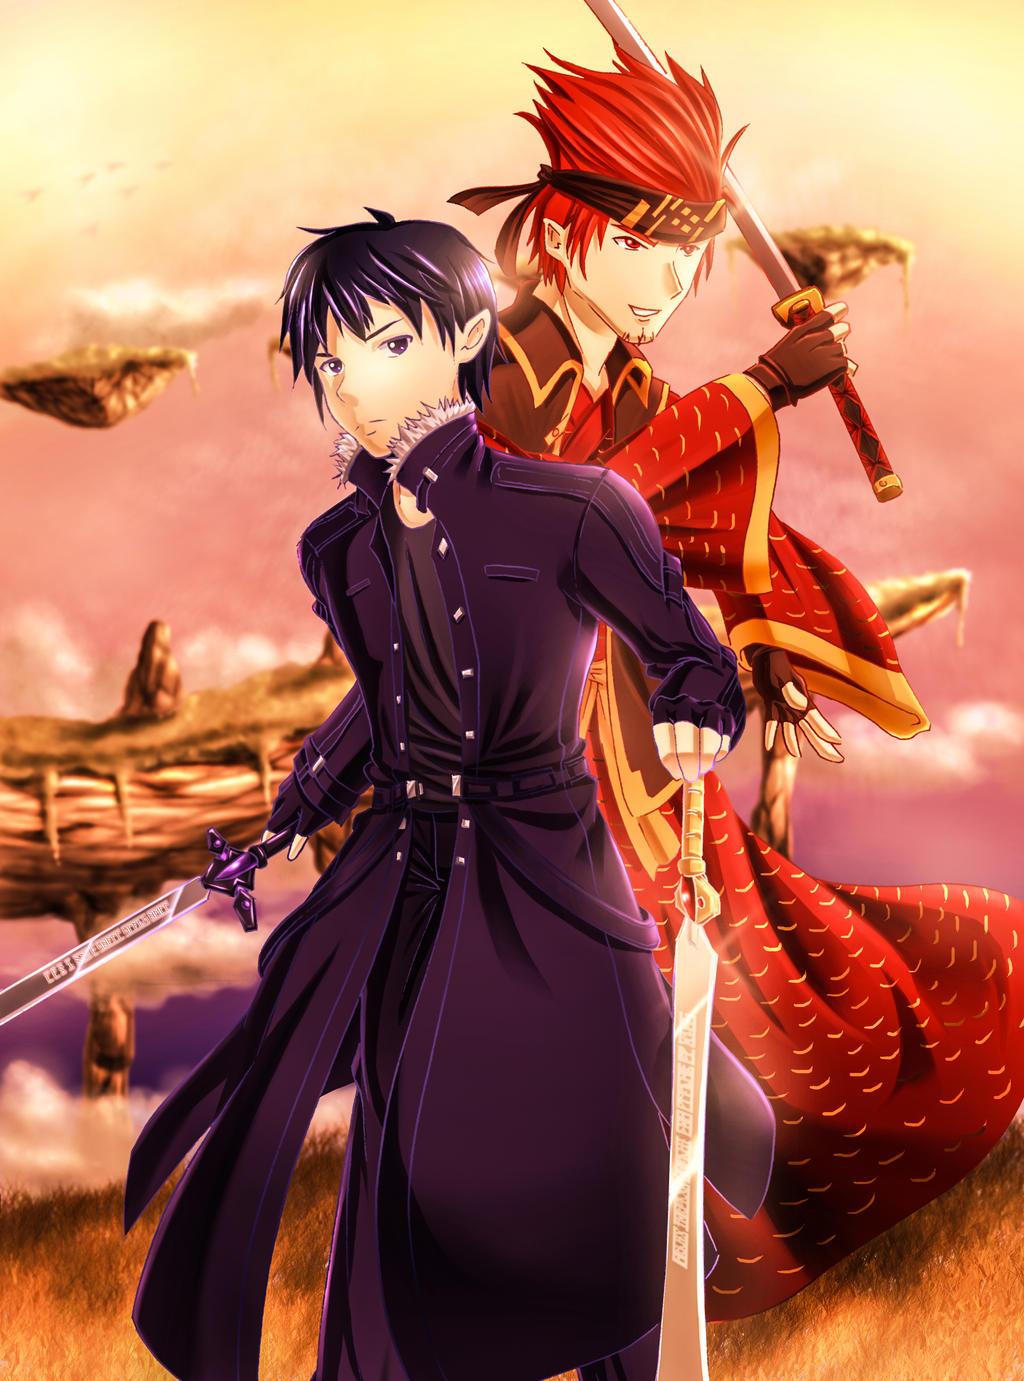 Sword art online kirito and klein by zephx watch fan art manga anime